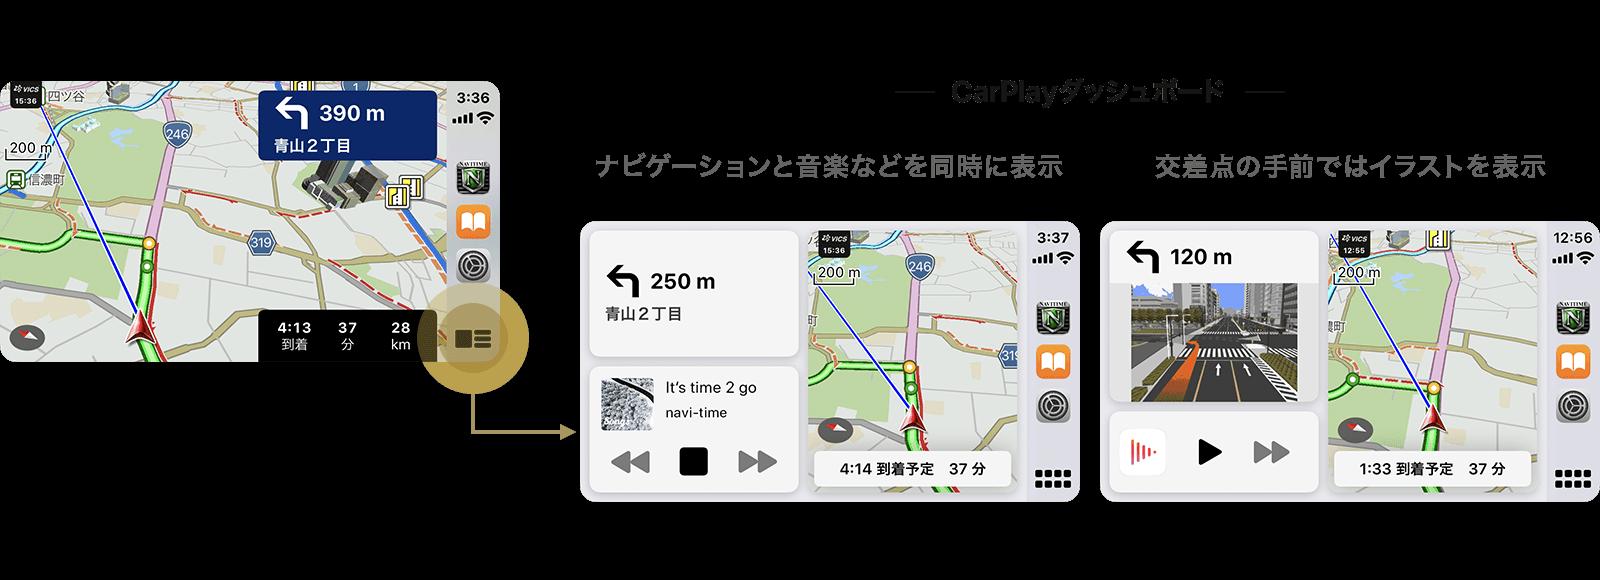 press_detail_cn_dashboard_202007.png